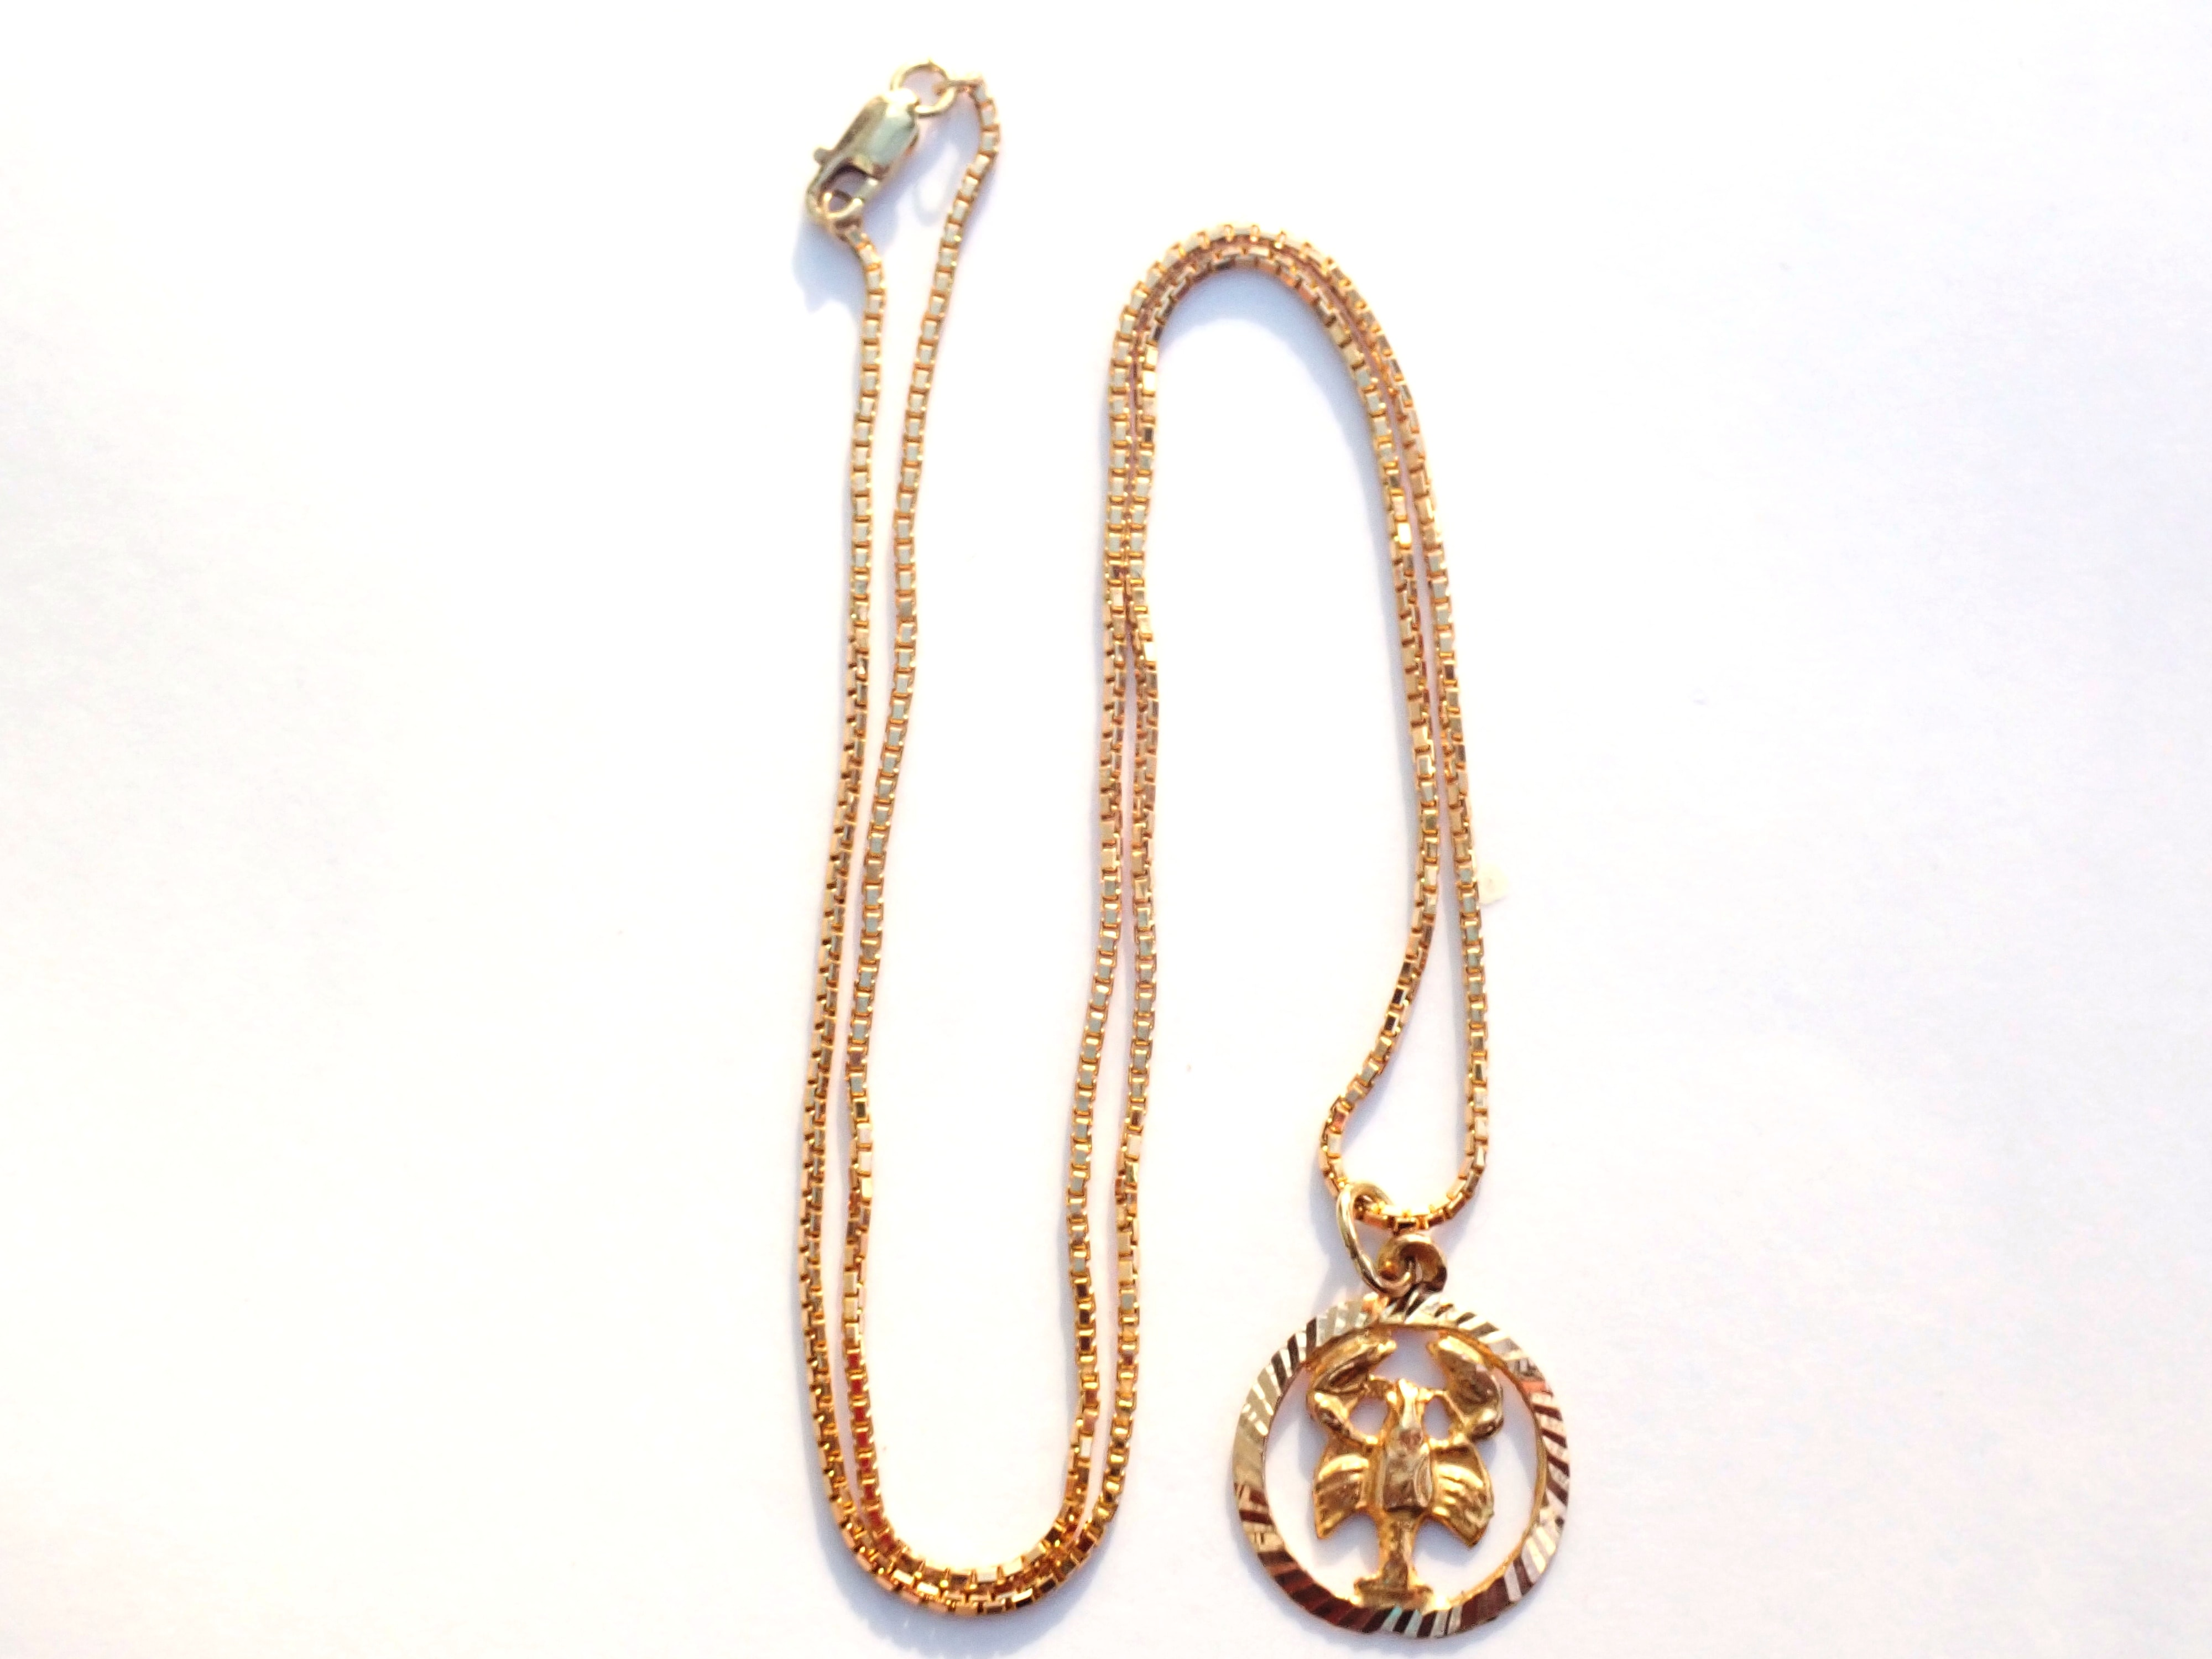 "AA000923 - 14k Solid Gold Scorpio October Star Sign Scorpion Pendant -14k 18"" Box Chain 5.6gms #150"